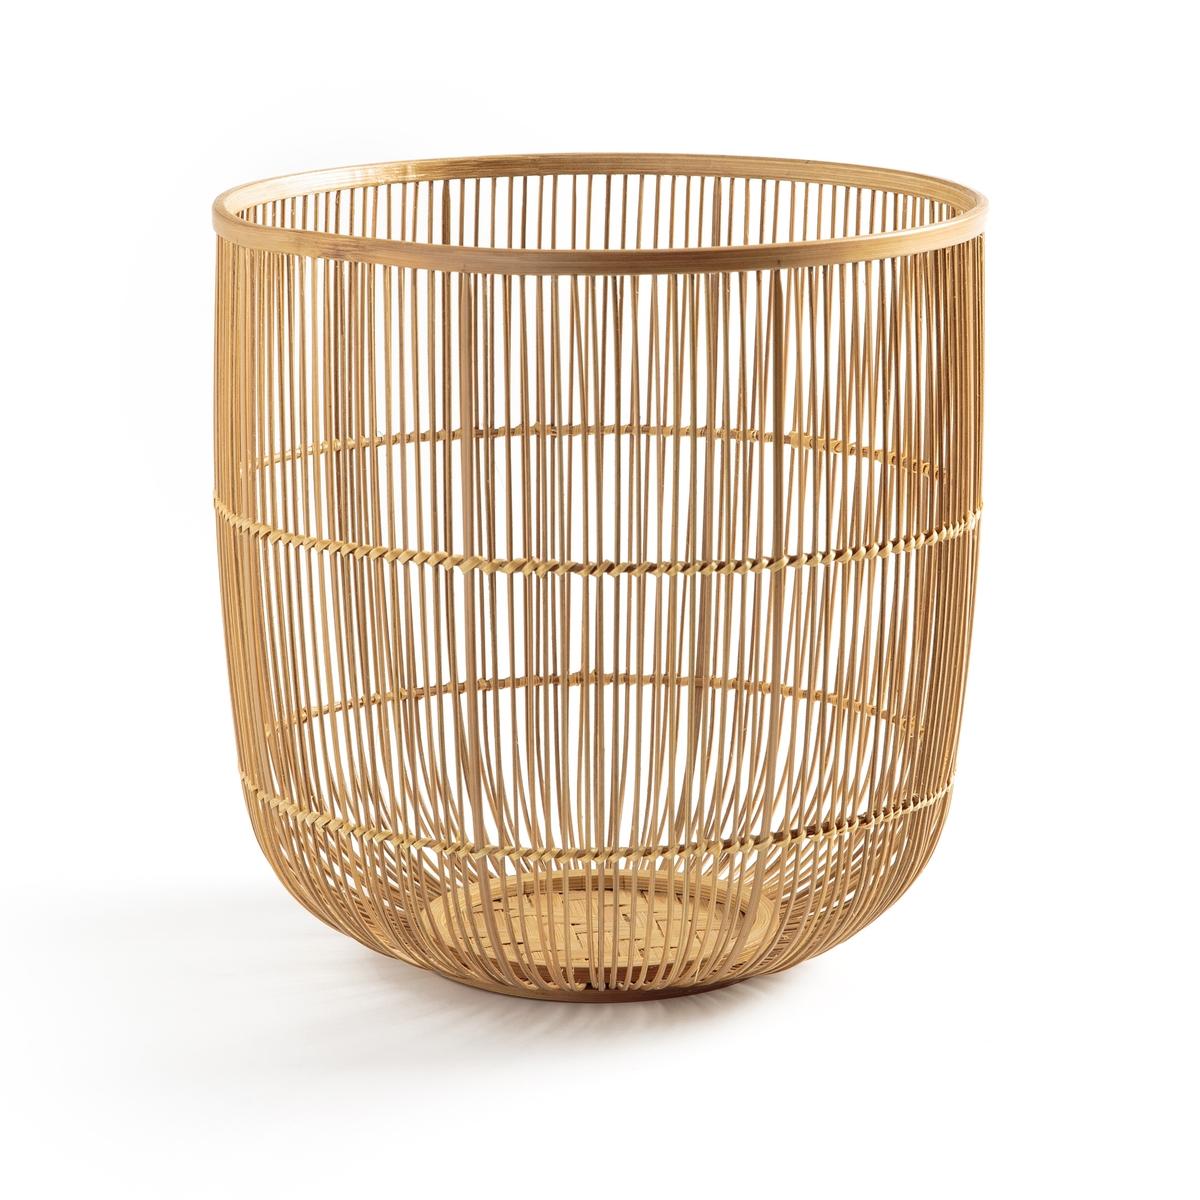 Cestino bambù intrecciato A25 cm Milise